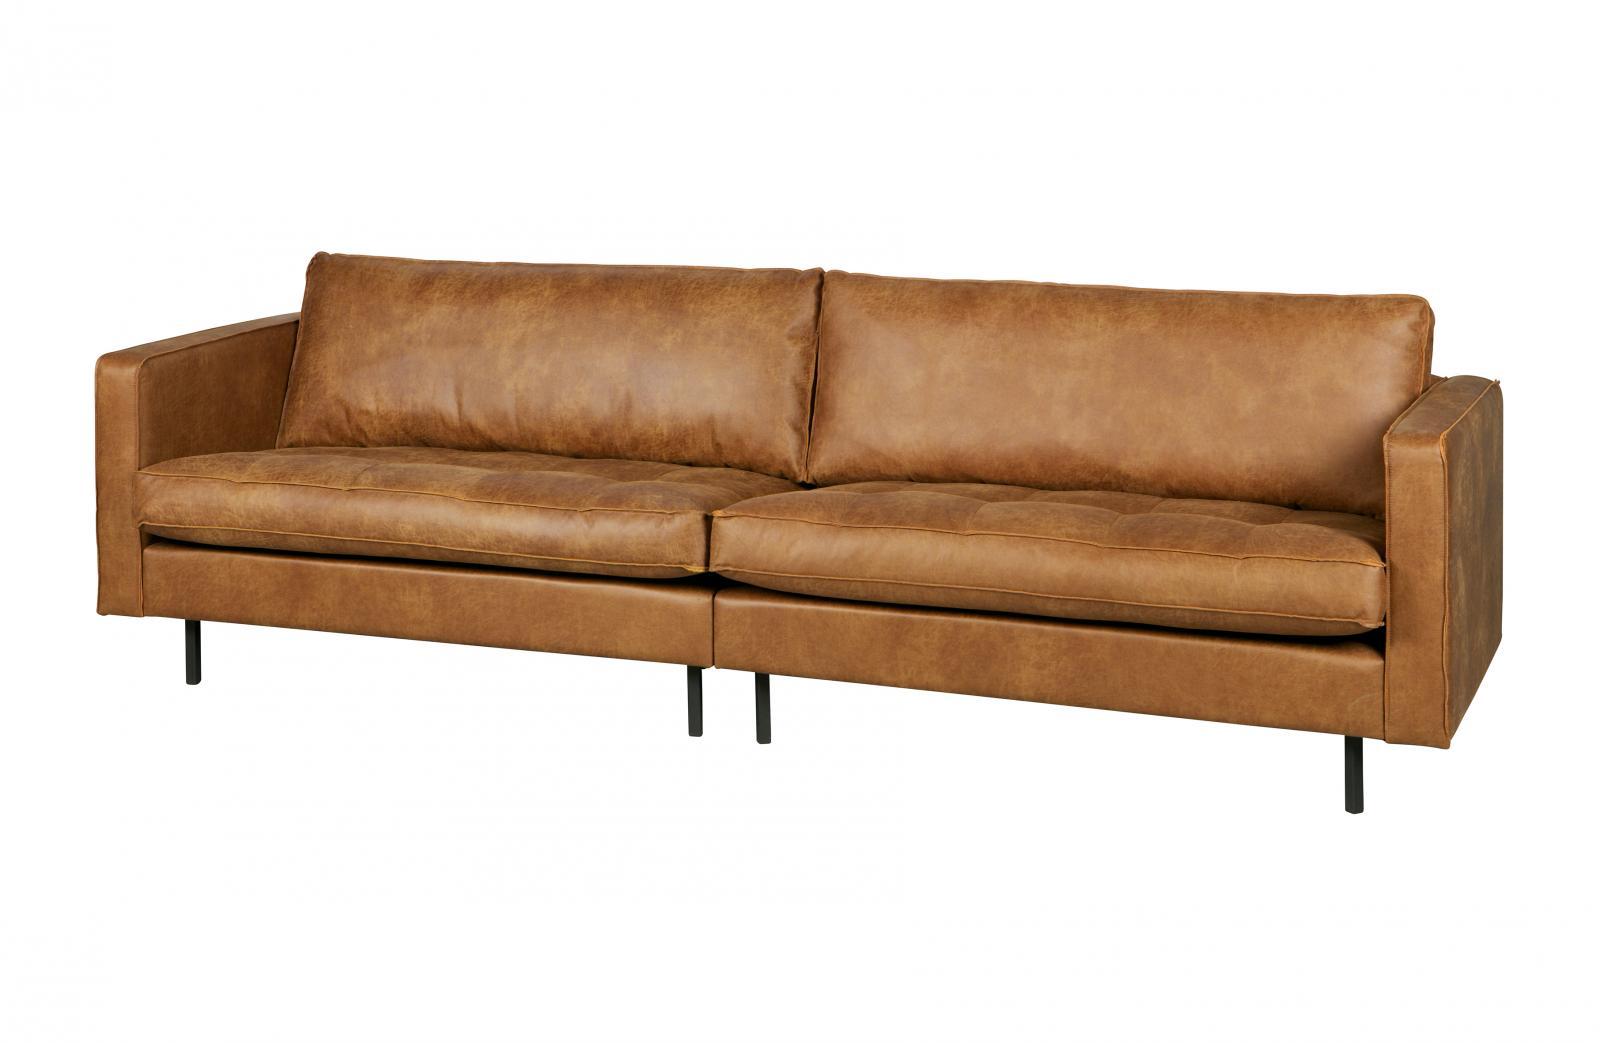 bepurehome rodeo classic ledersofa 3 sitzer cognac. Black Bedroom Furniture Sets. Home Design Ideas